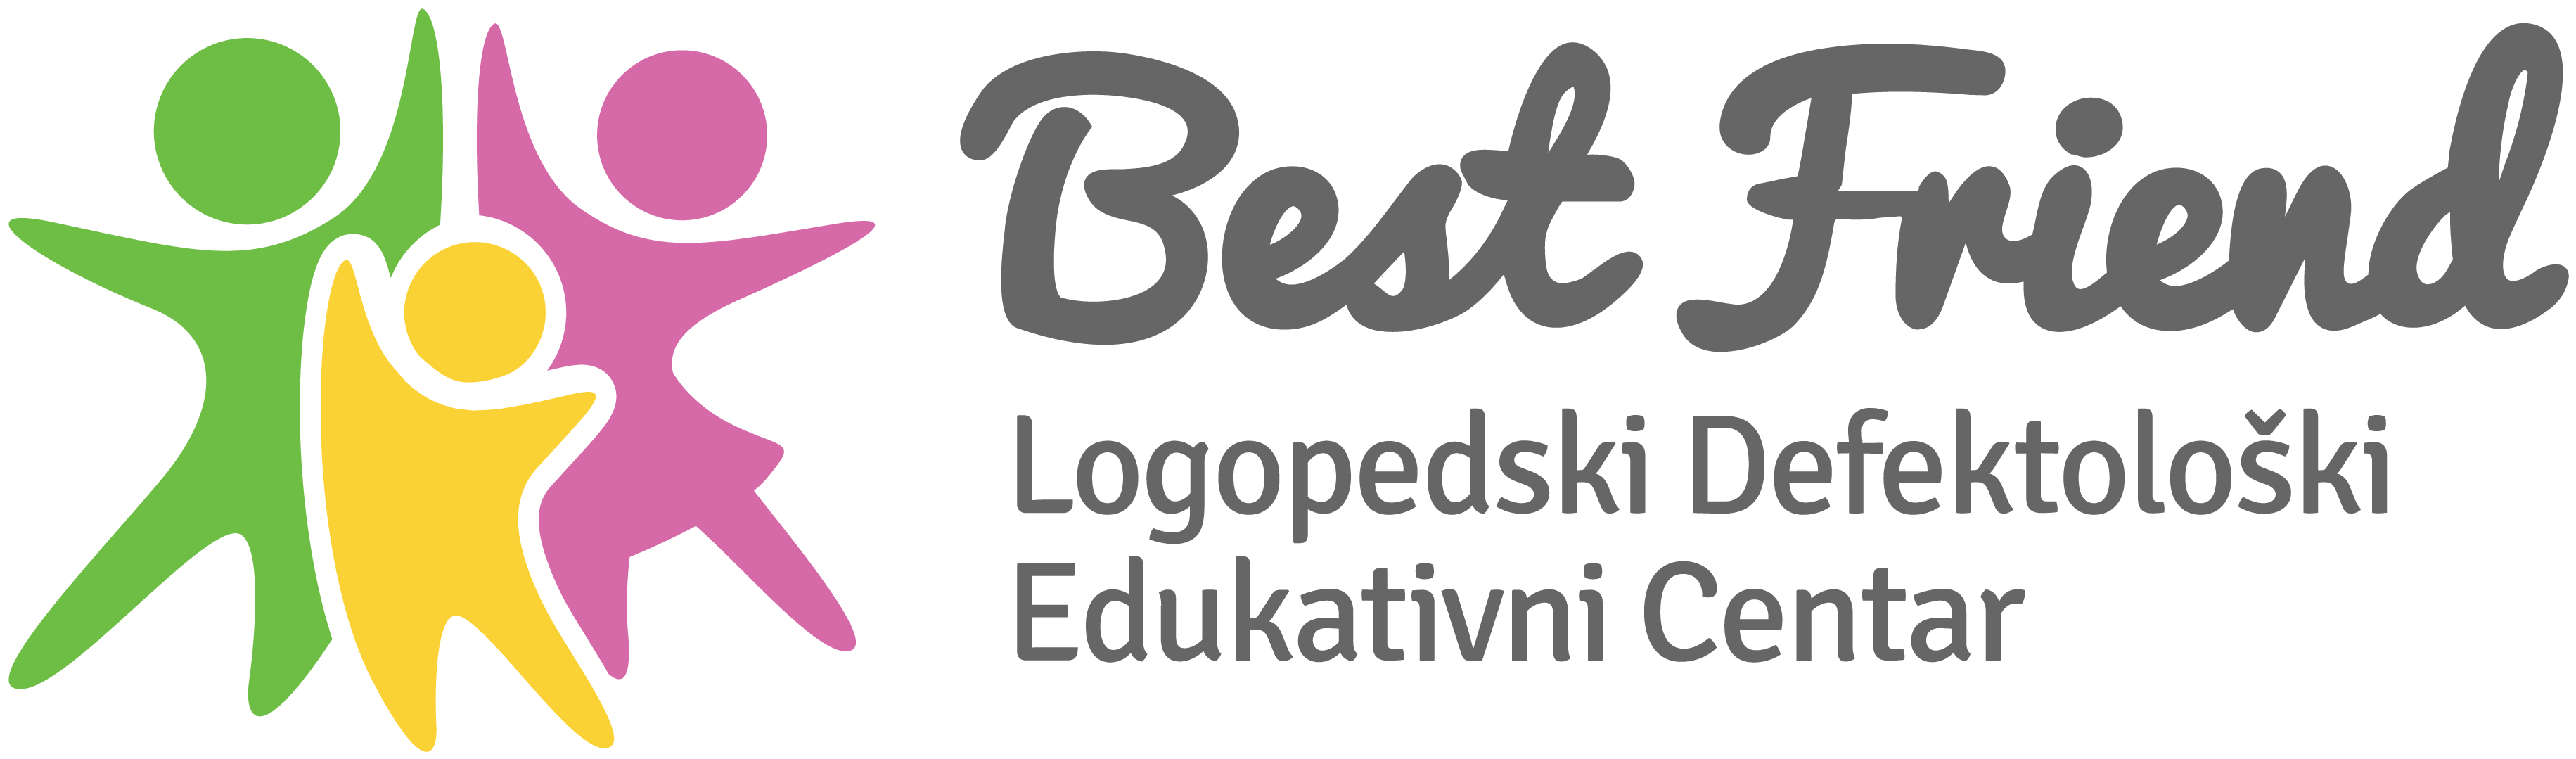 Logopedskicentar Best Friend logo